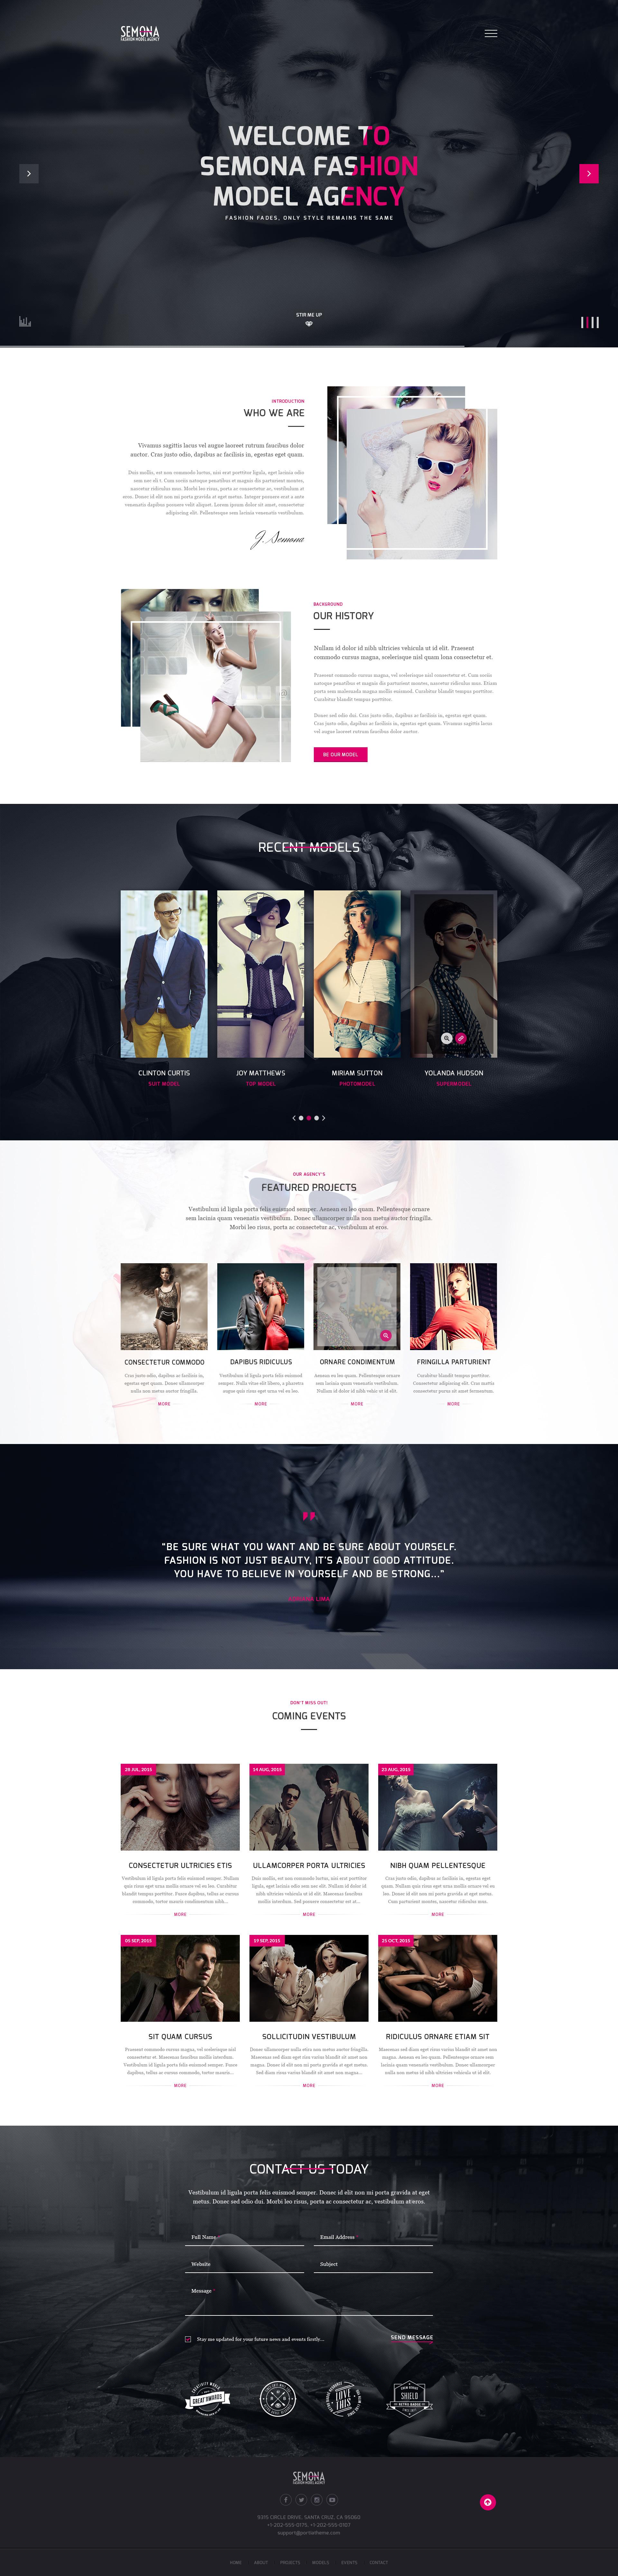 Fashion Semona - Creative Joomla Template by templaza   ThemeForest 18b5ca1ca7a7